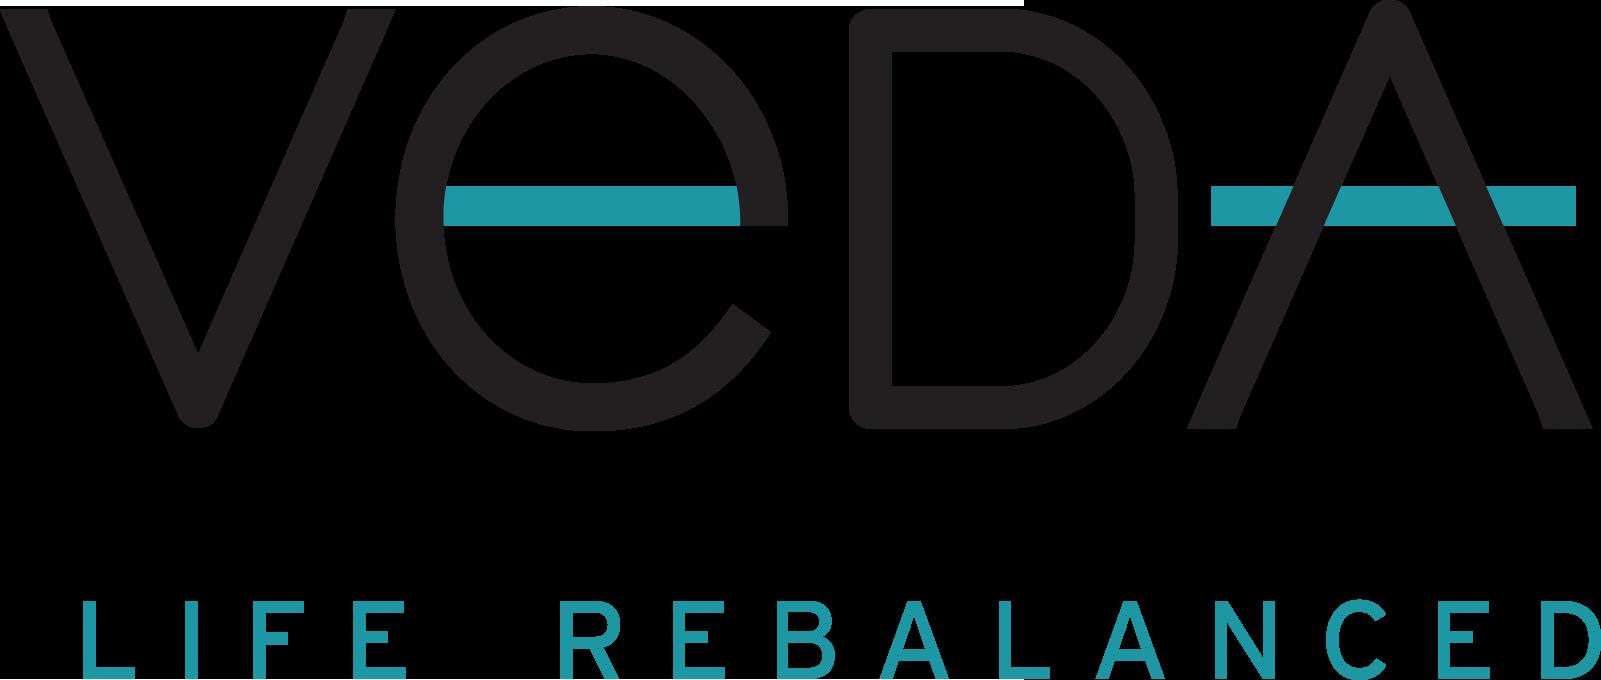 Vestibular Disorders Association (VEDA)